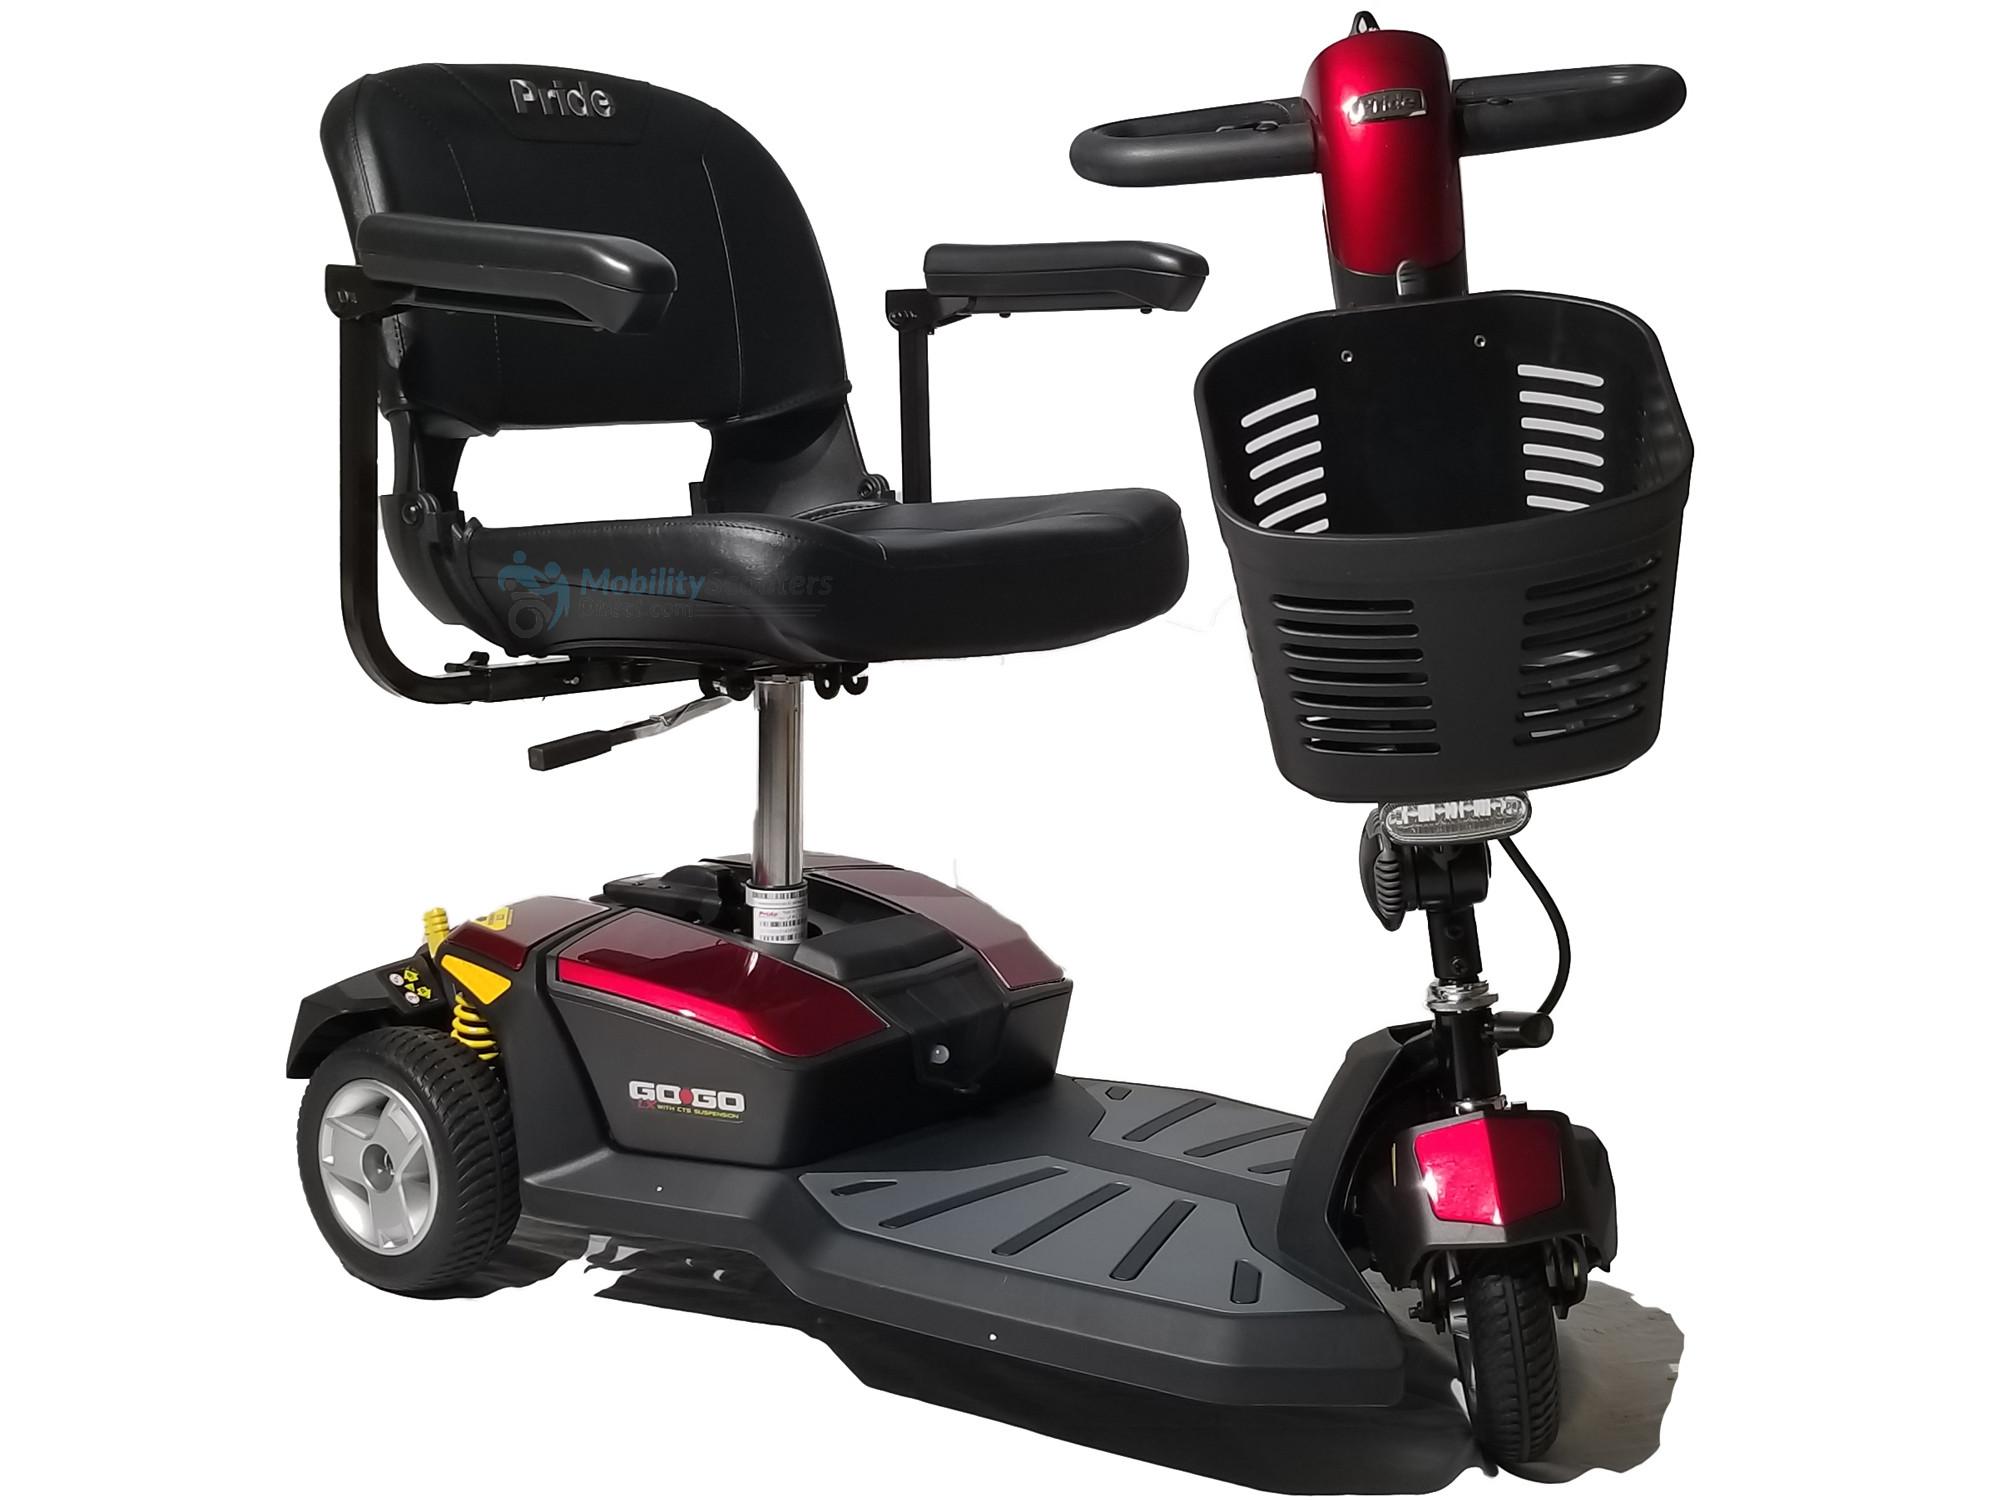 Pride Go-Go LX Mobility Scooter 3-Wheel